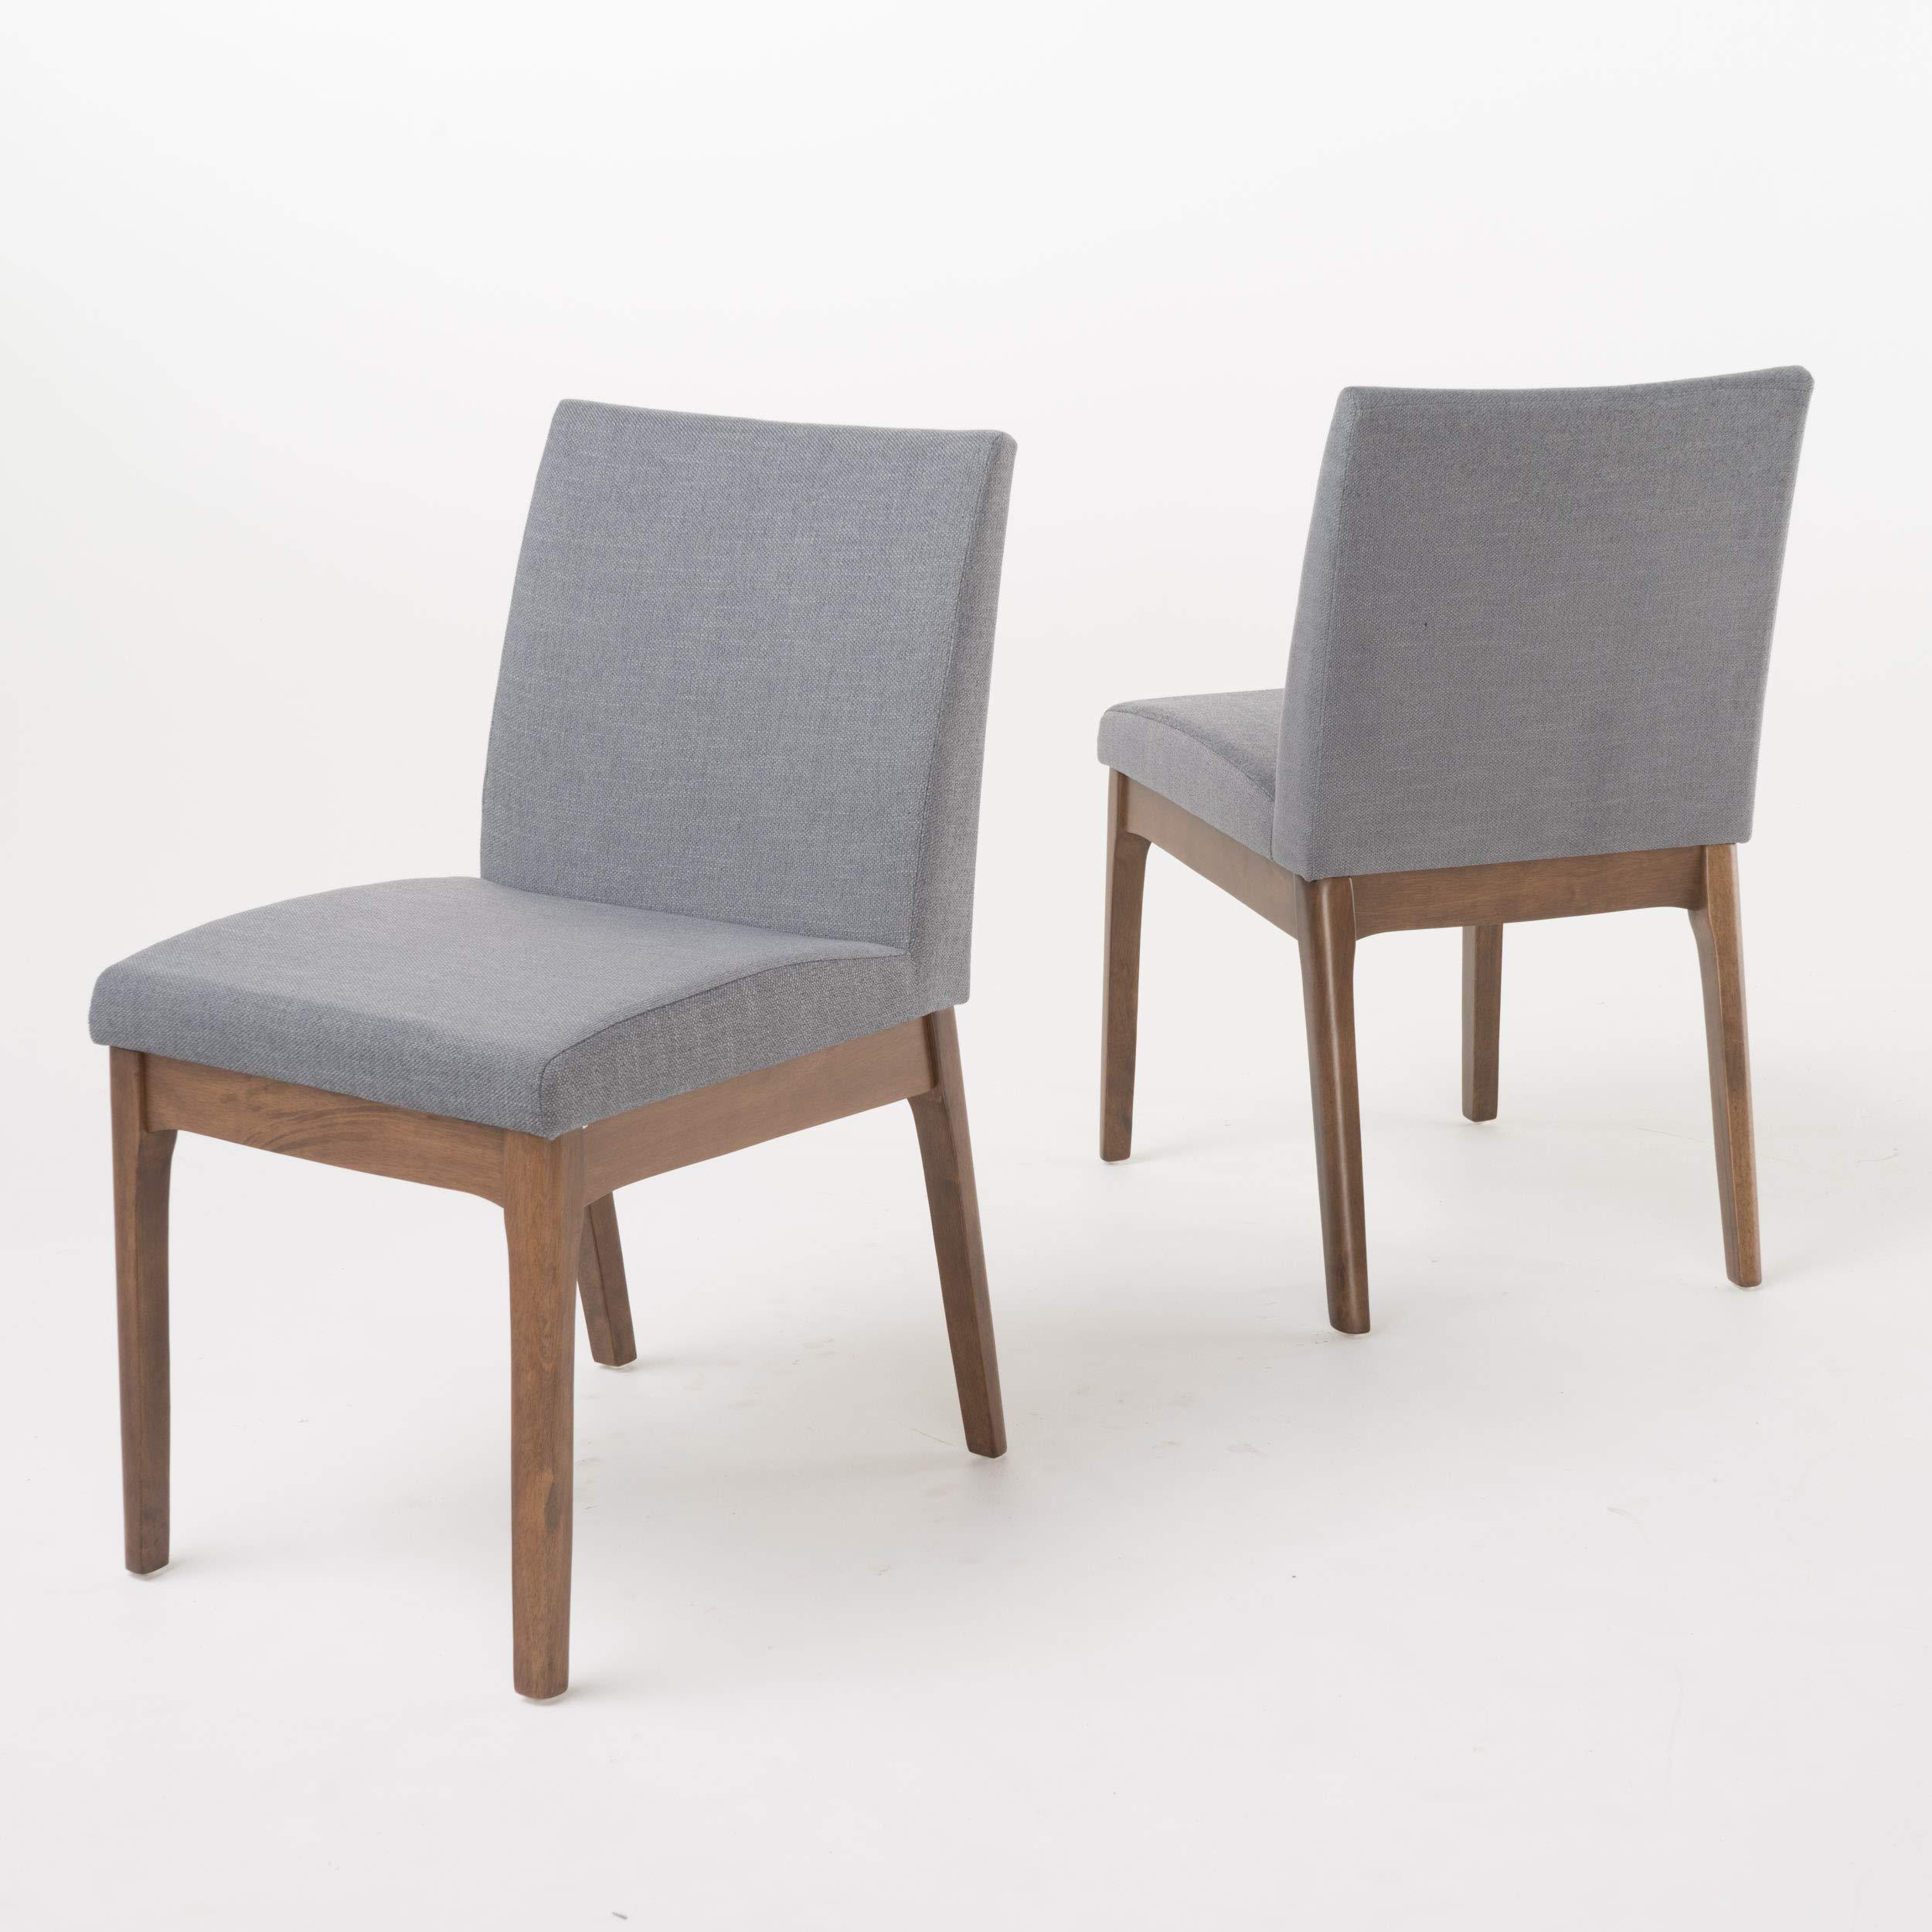 Katherine Dark Grey Fabric/Natural Walnut Finish Curved Leg Rectangular 5 Piece Mid Century Modern Dining Set by GDF Studio (Image #4)